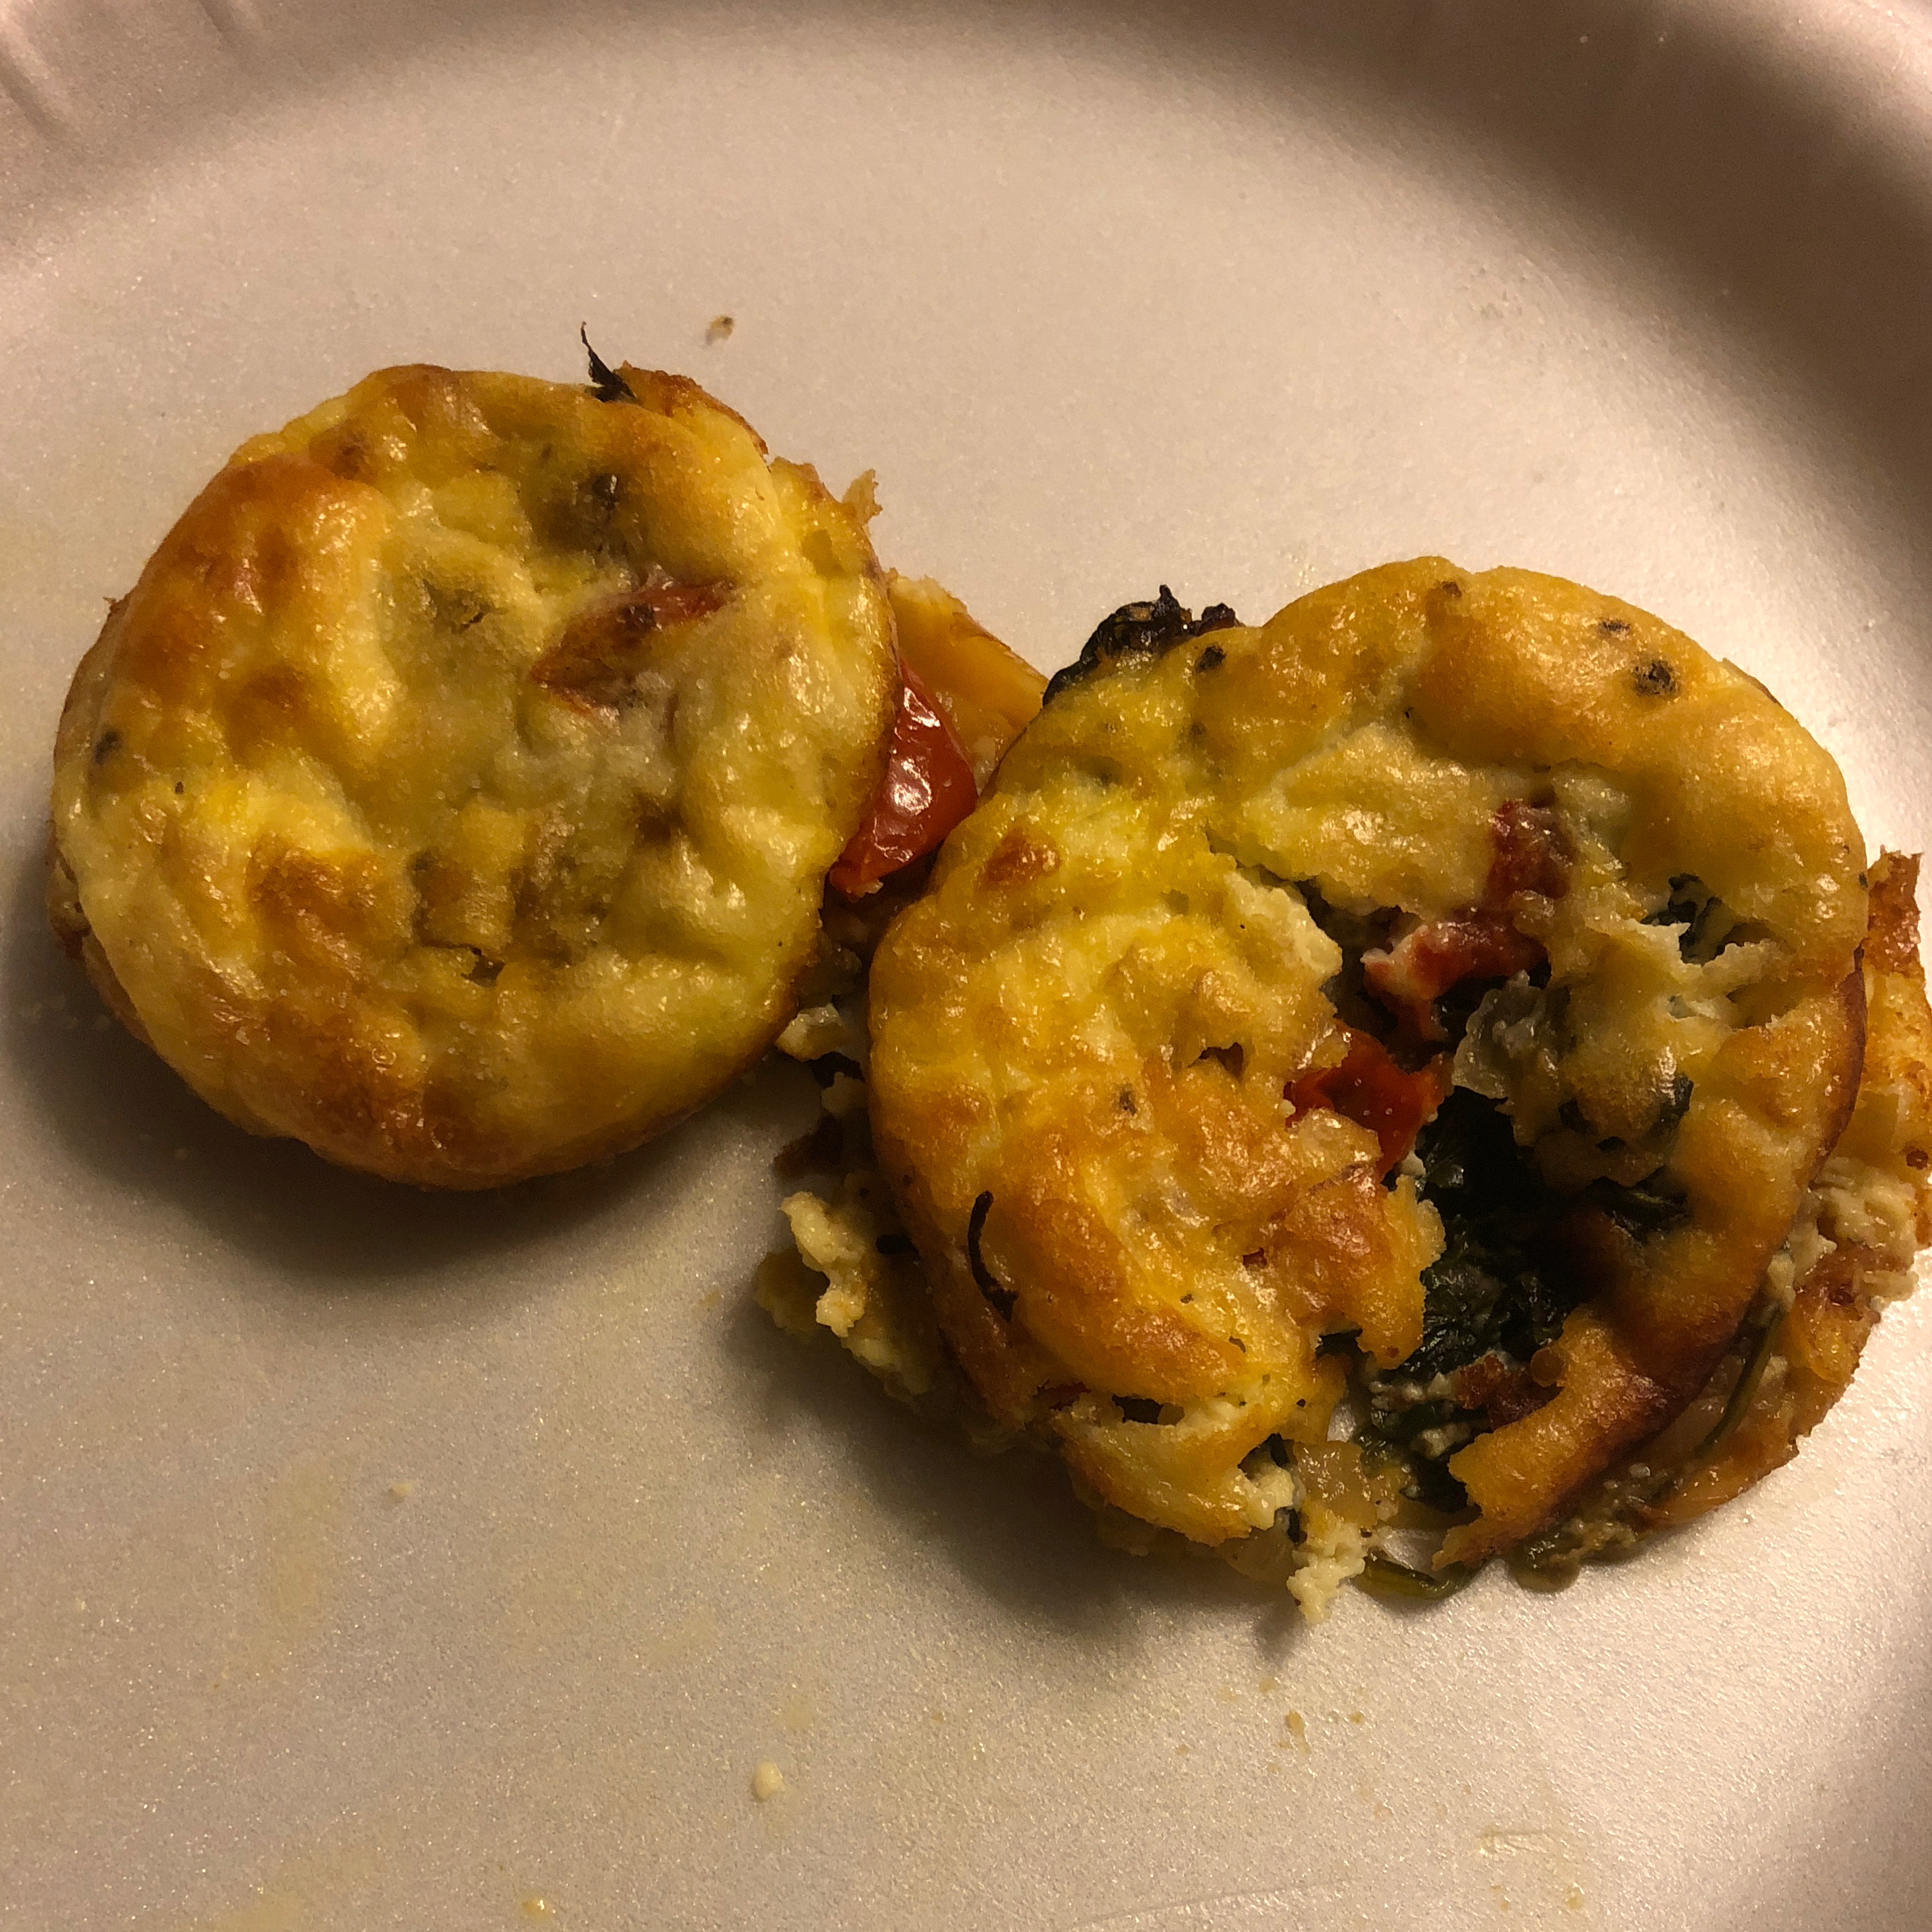 Crustless Spinach, Mushroom, and Tomato Quiche (Keto) Amy Jensen Hilburn